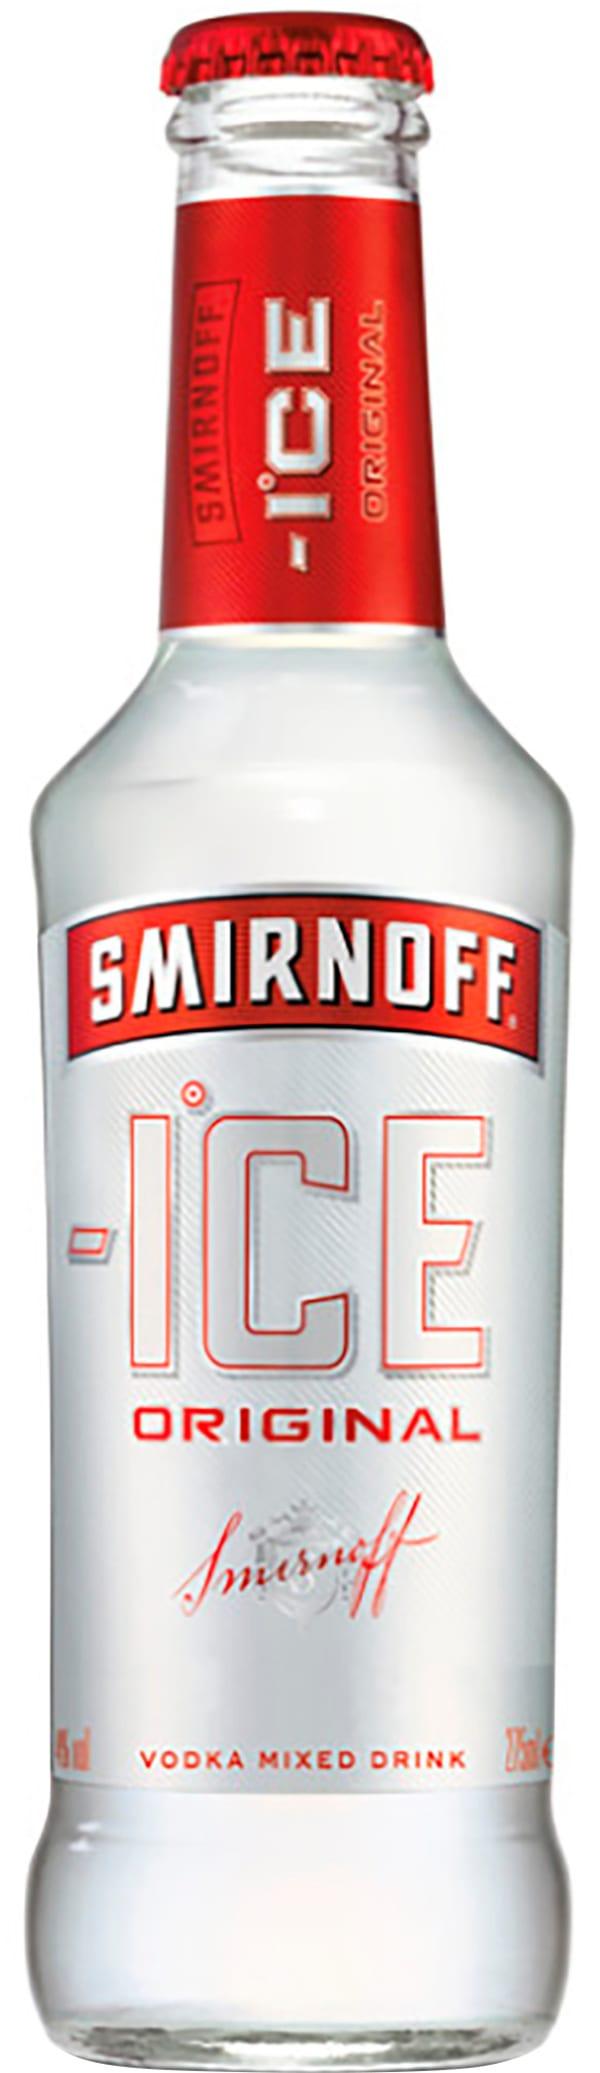 Smirnoff Ice plastic bottle